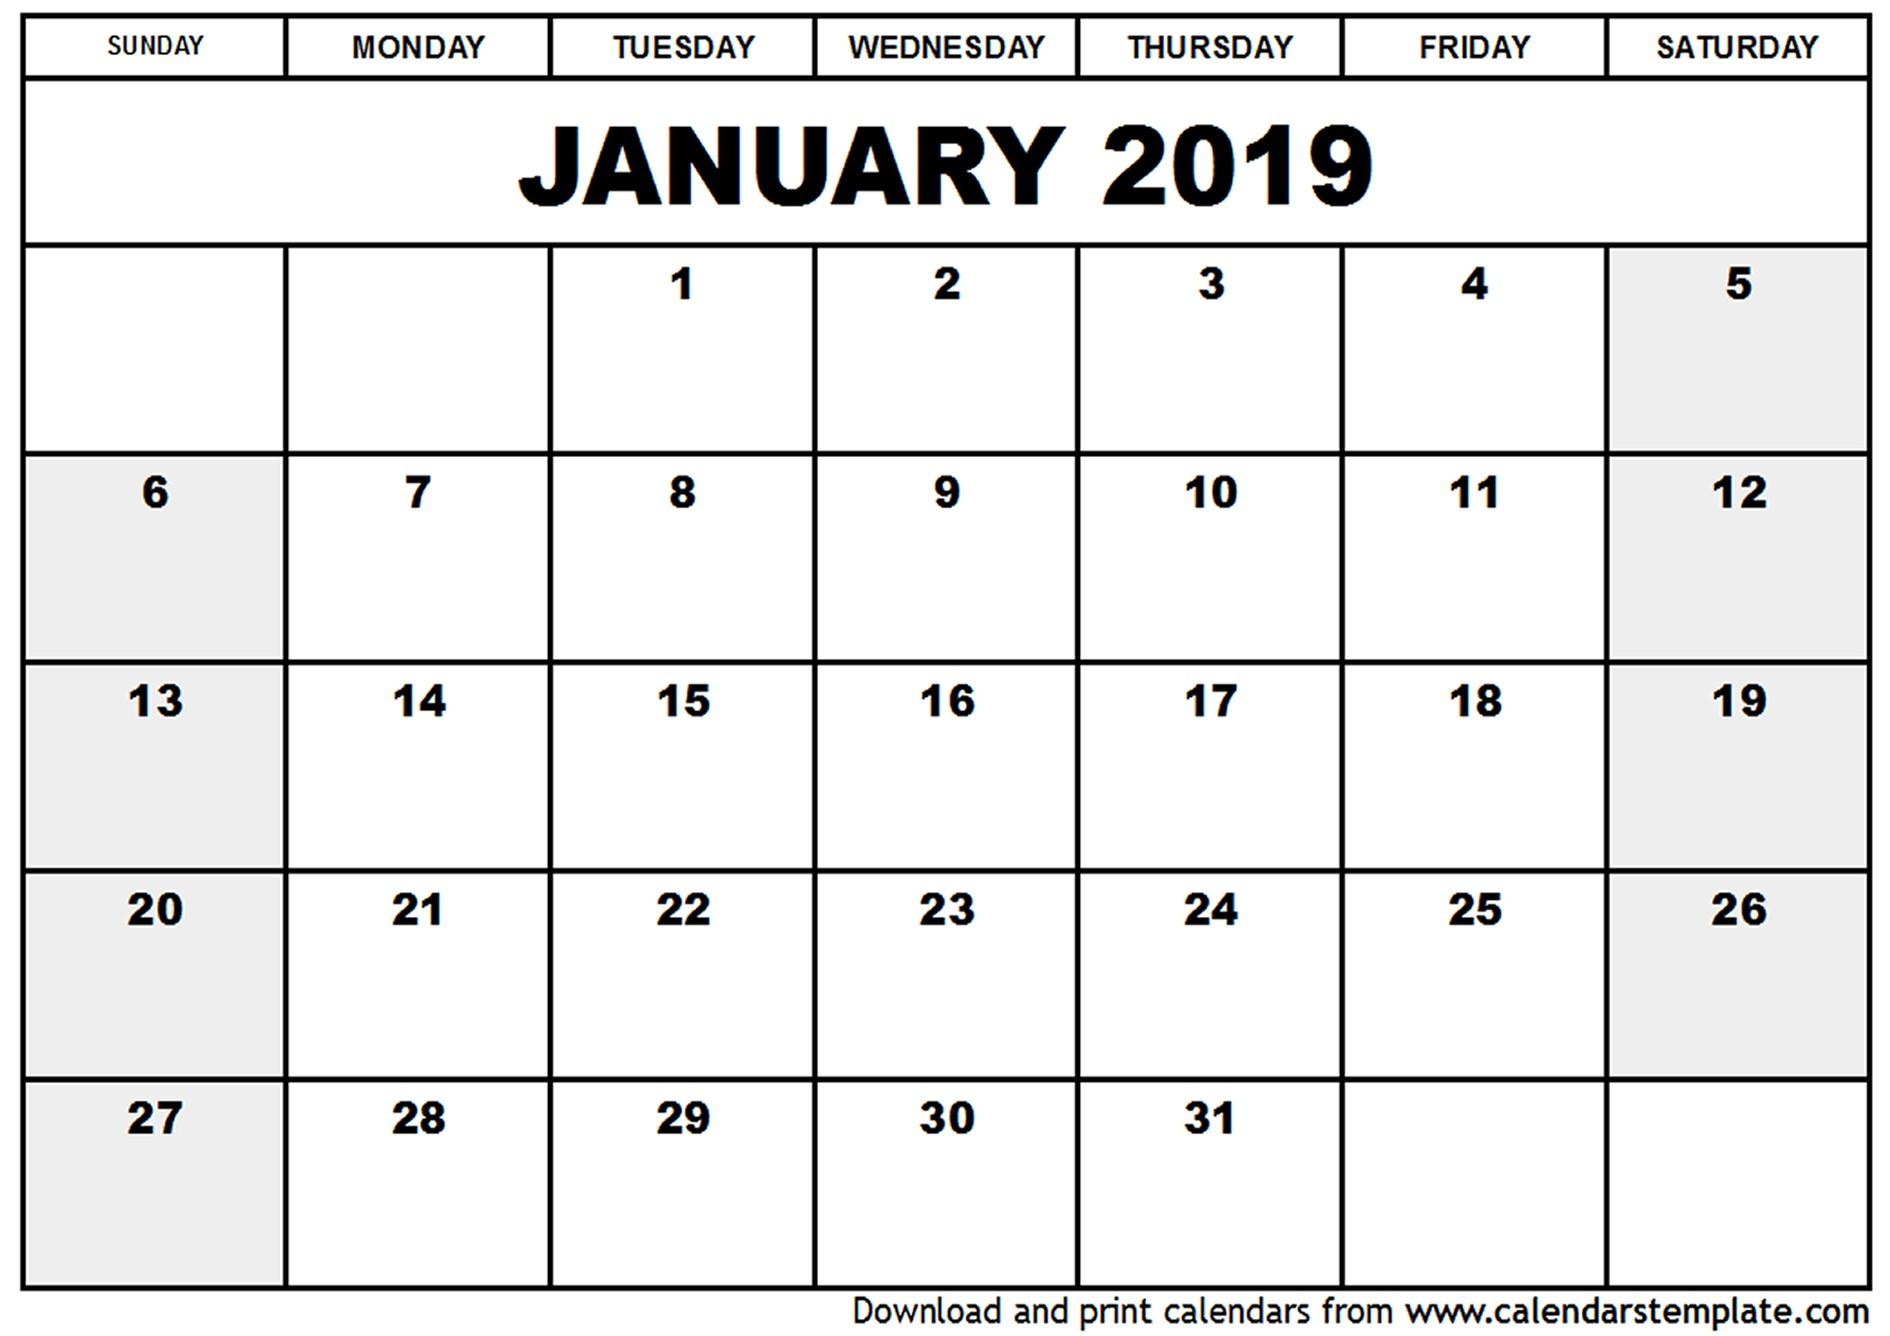 January 2019 Calendar Template